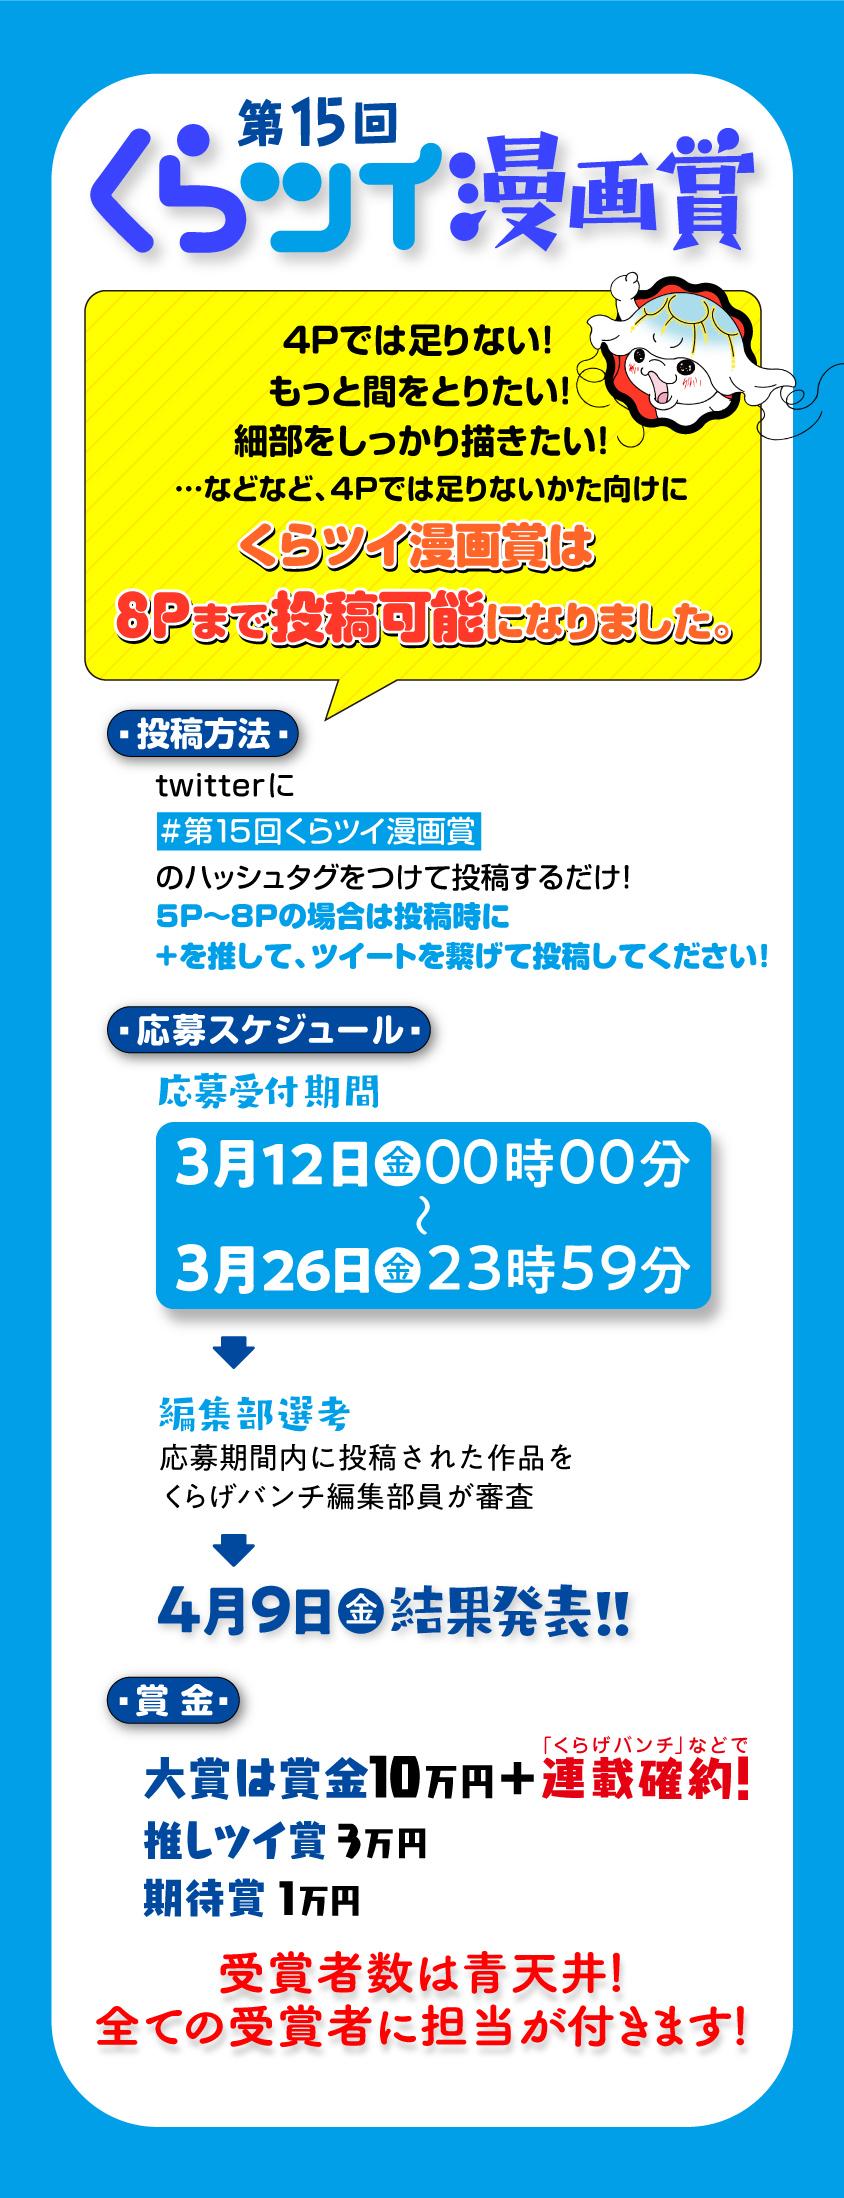 f:id:kuragebunch:20210107225140j:plain